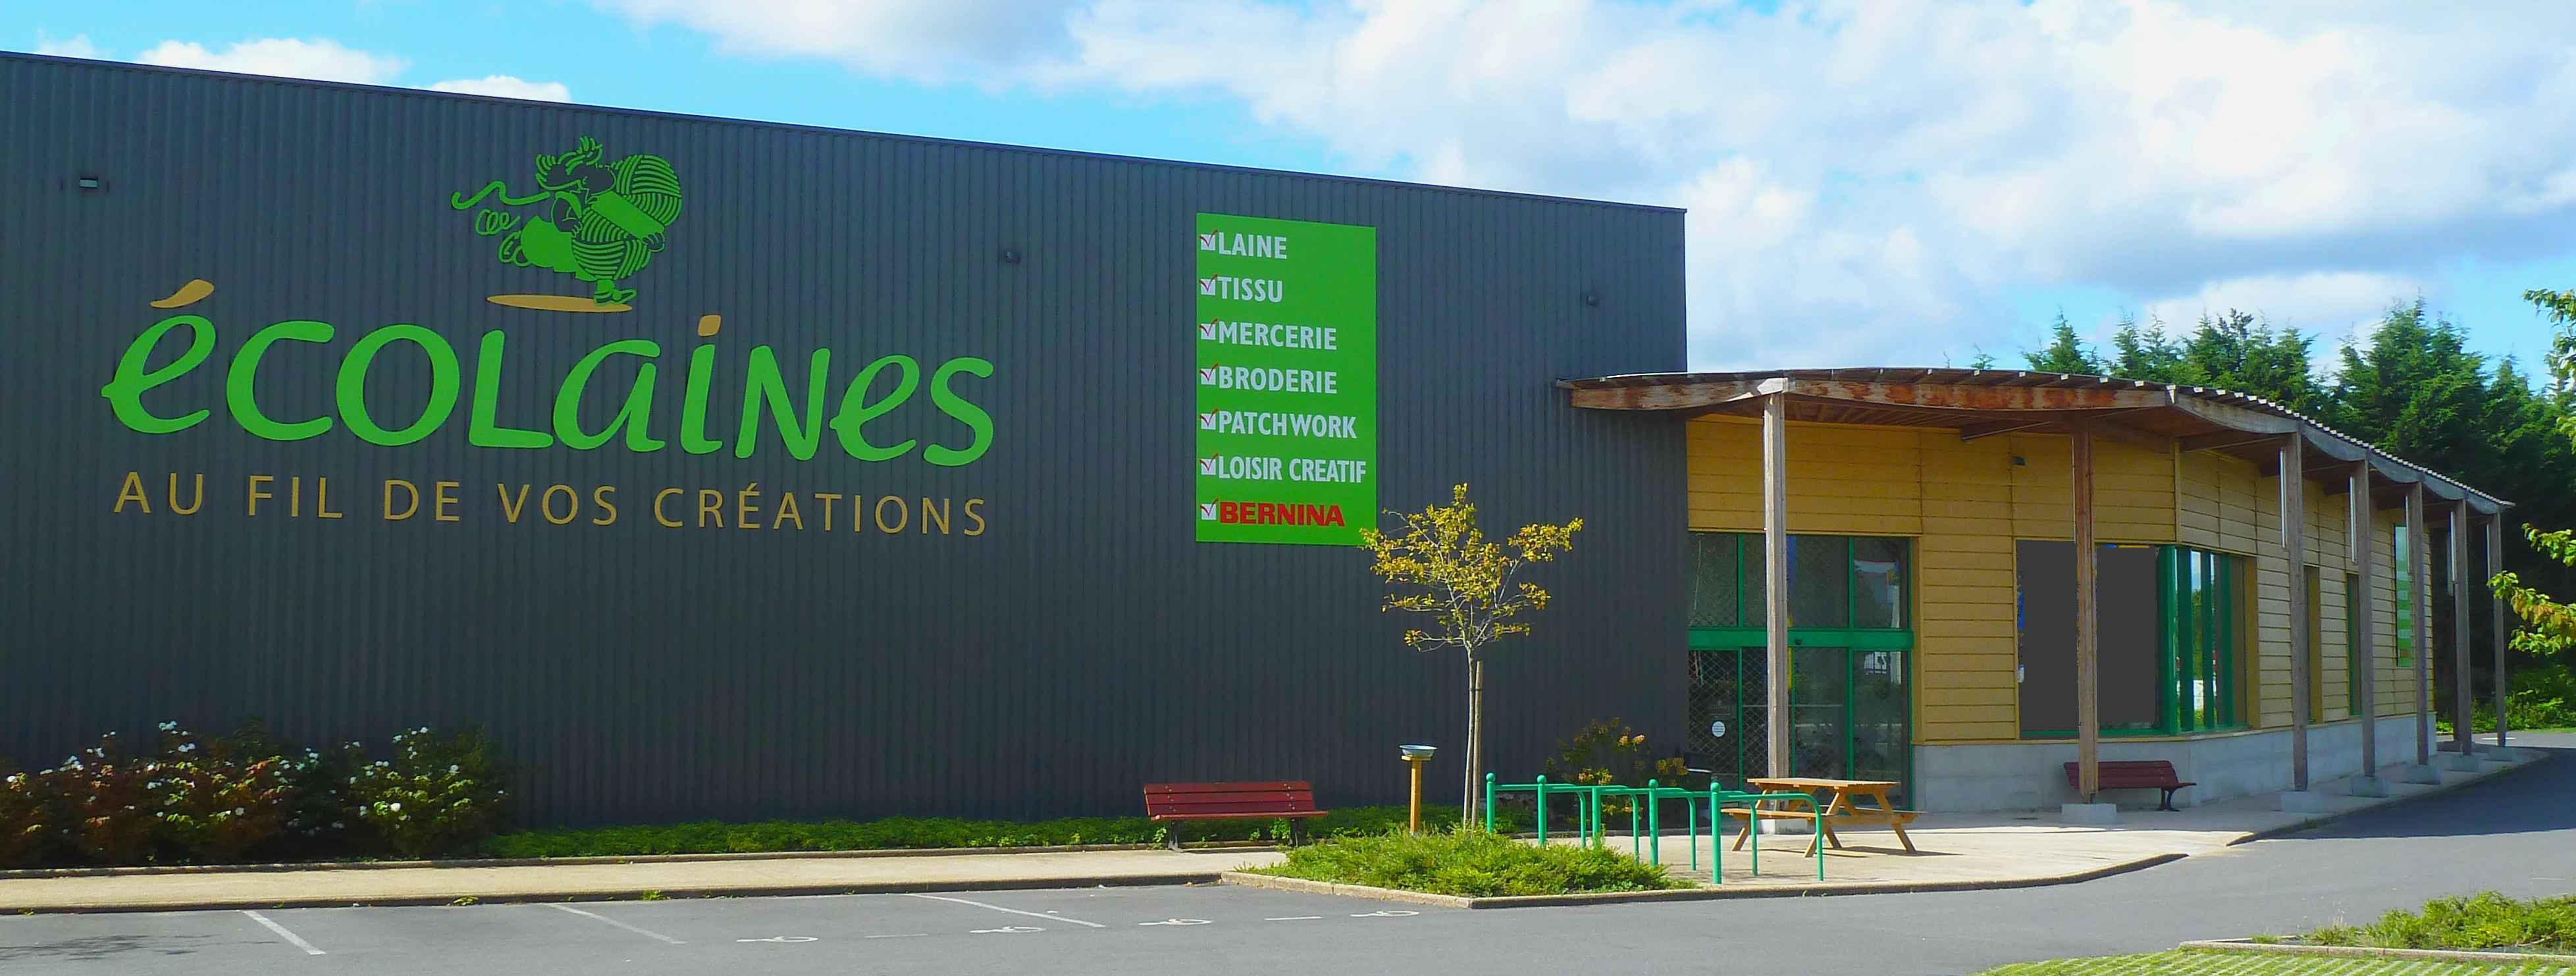 Photo de façade du magasin Ecolaines